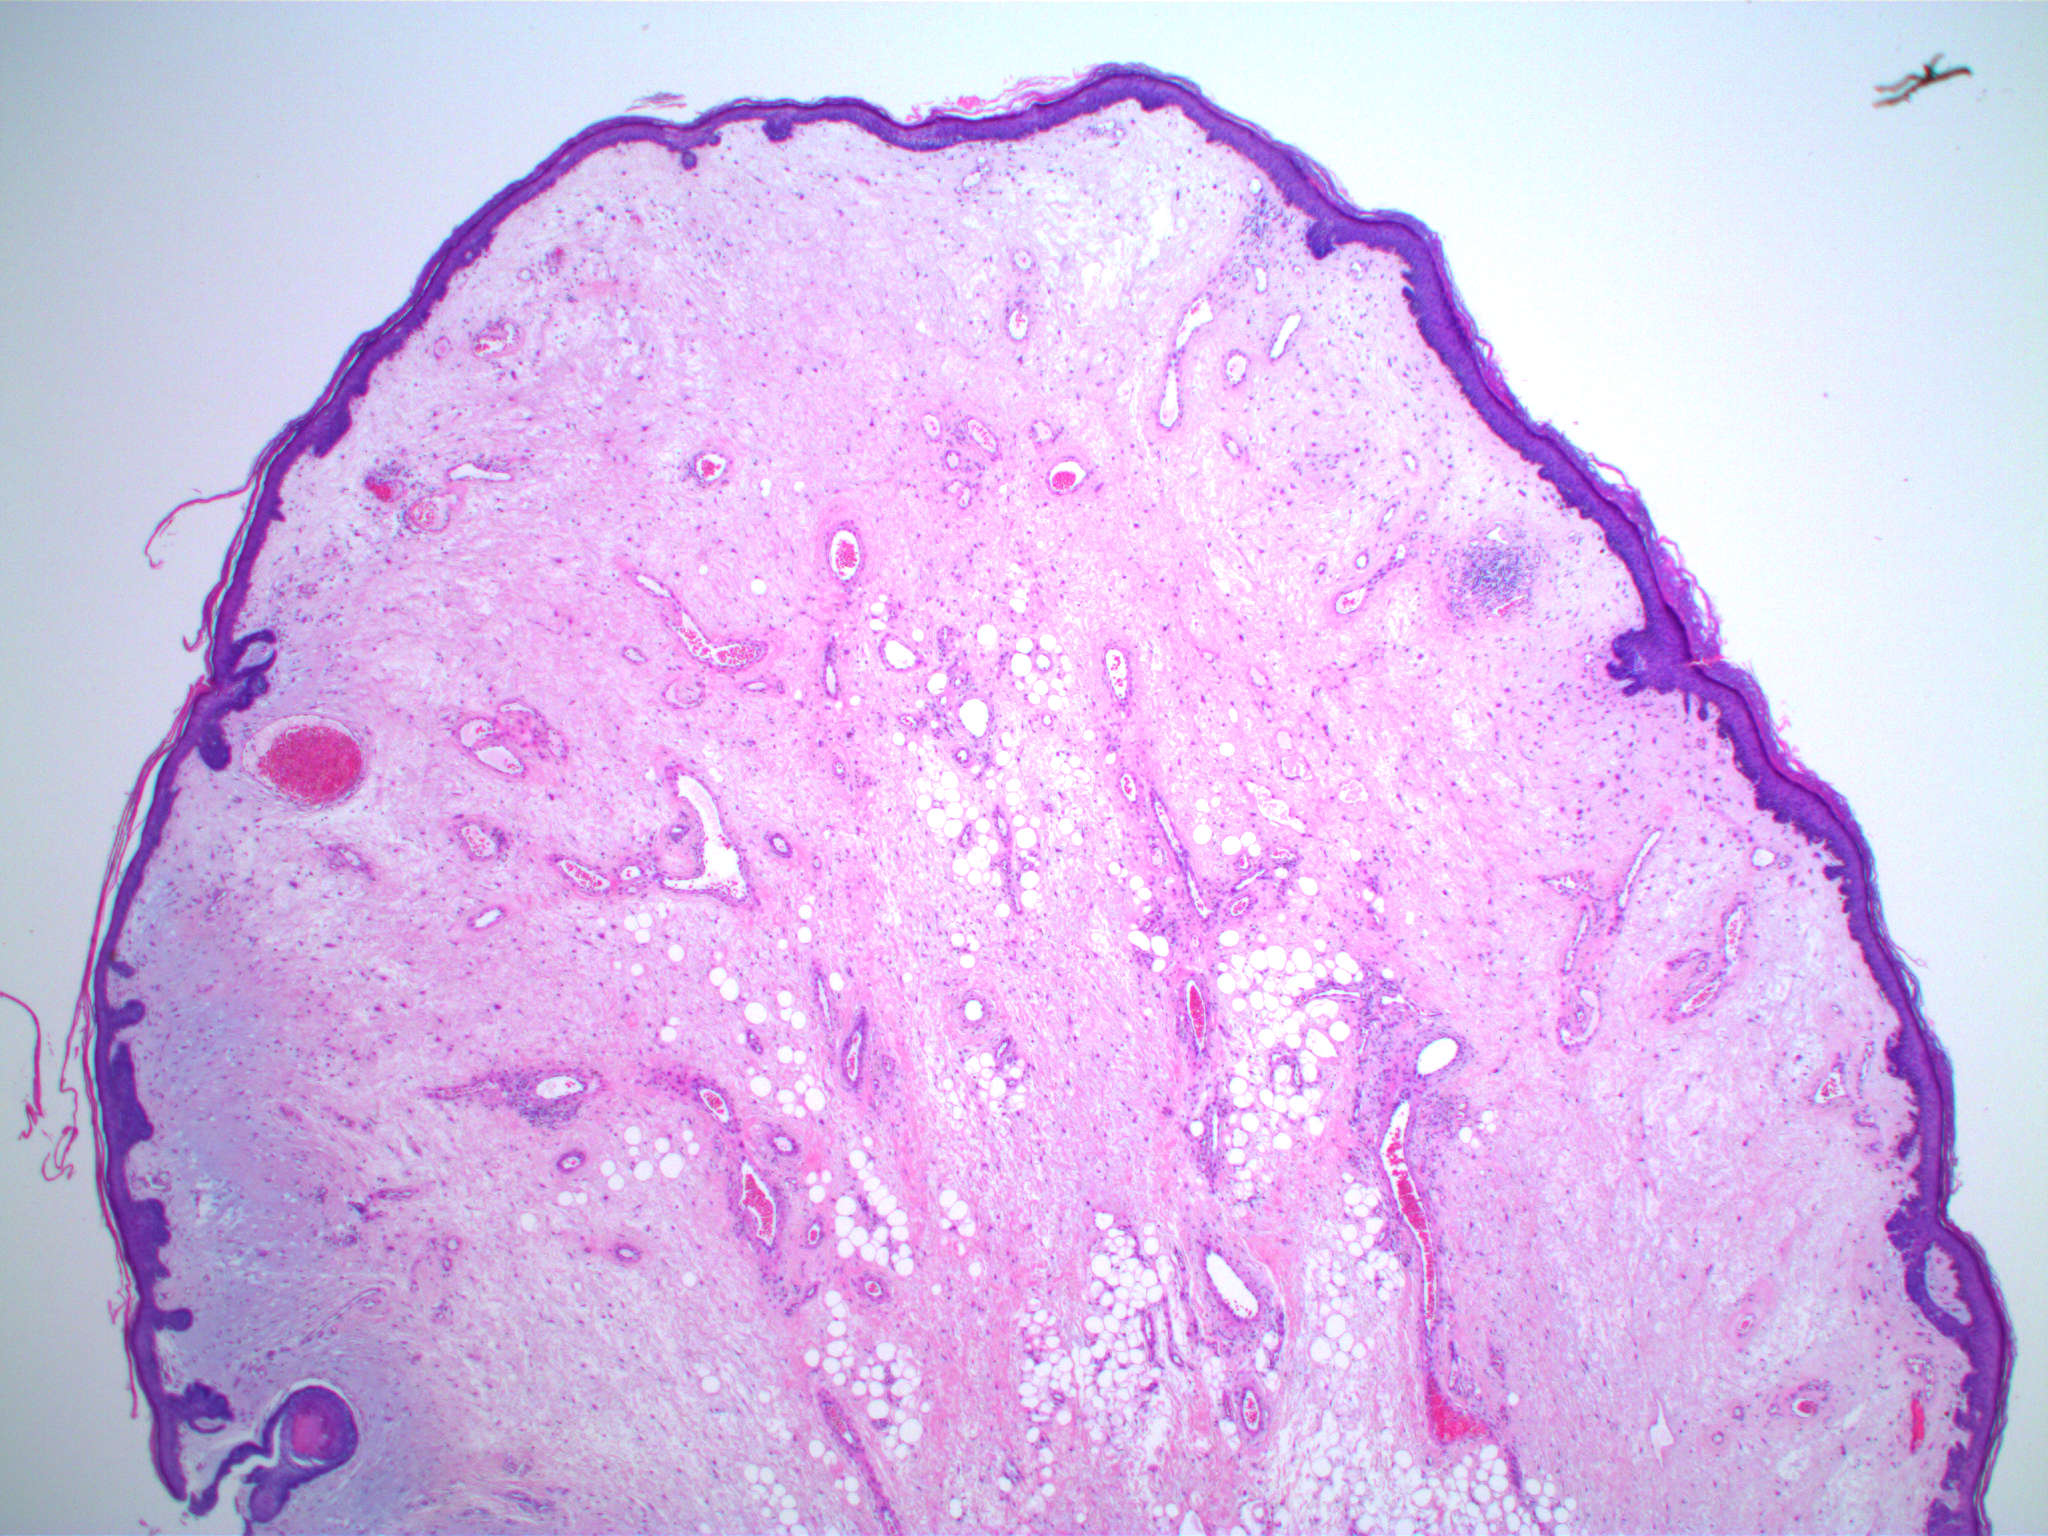 Stromal edema